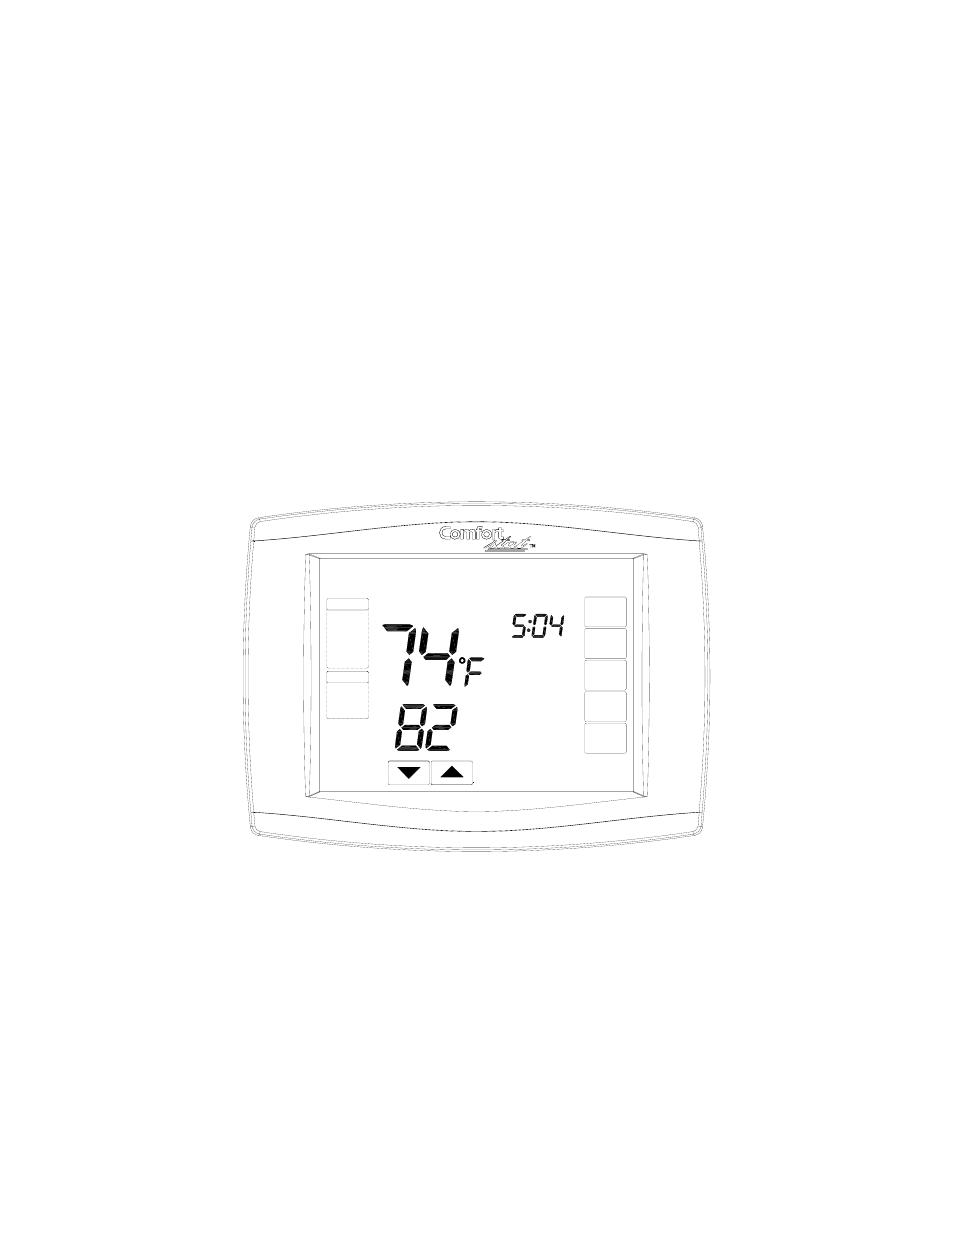 comfort stat cdt901 user manual